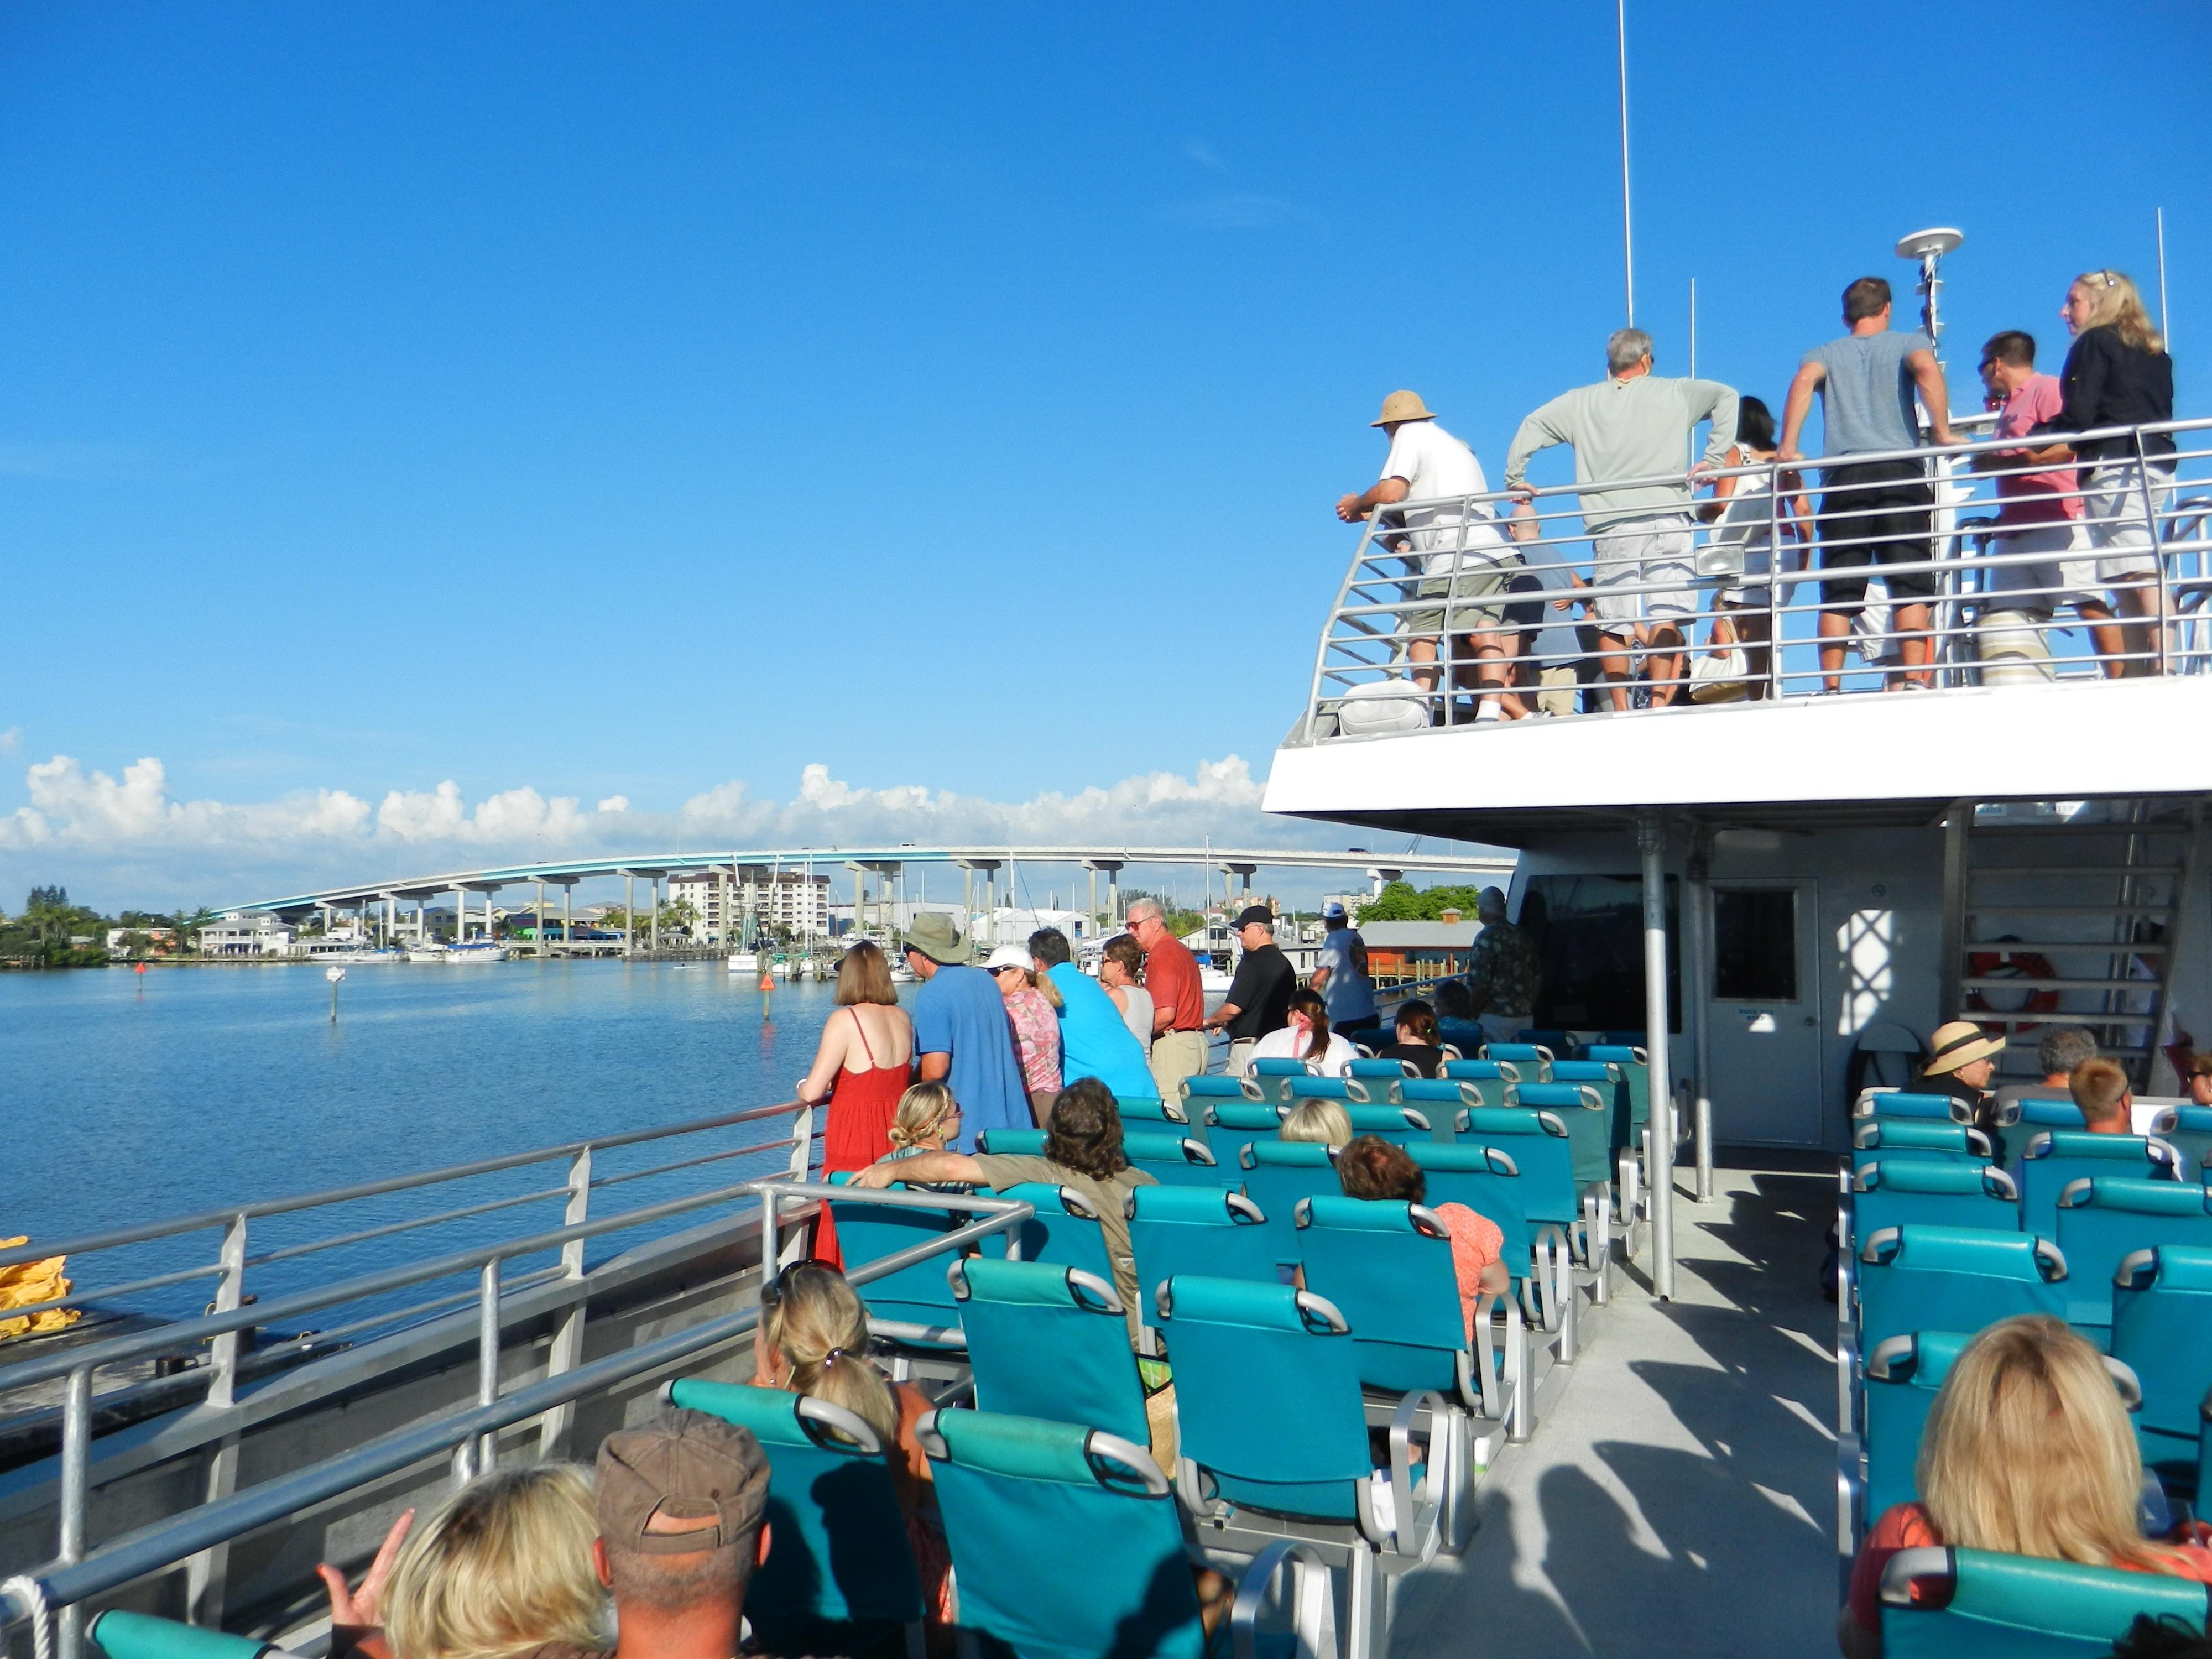 Fort_Myers_Beach_Key_West_Express_1.jpg